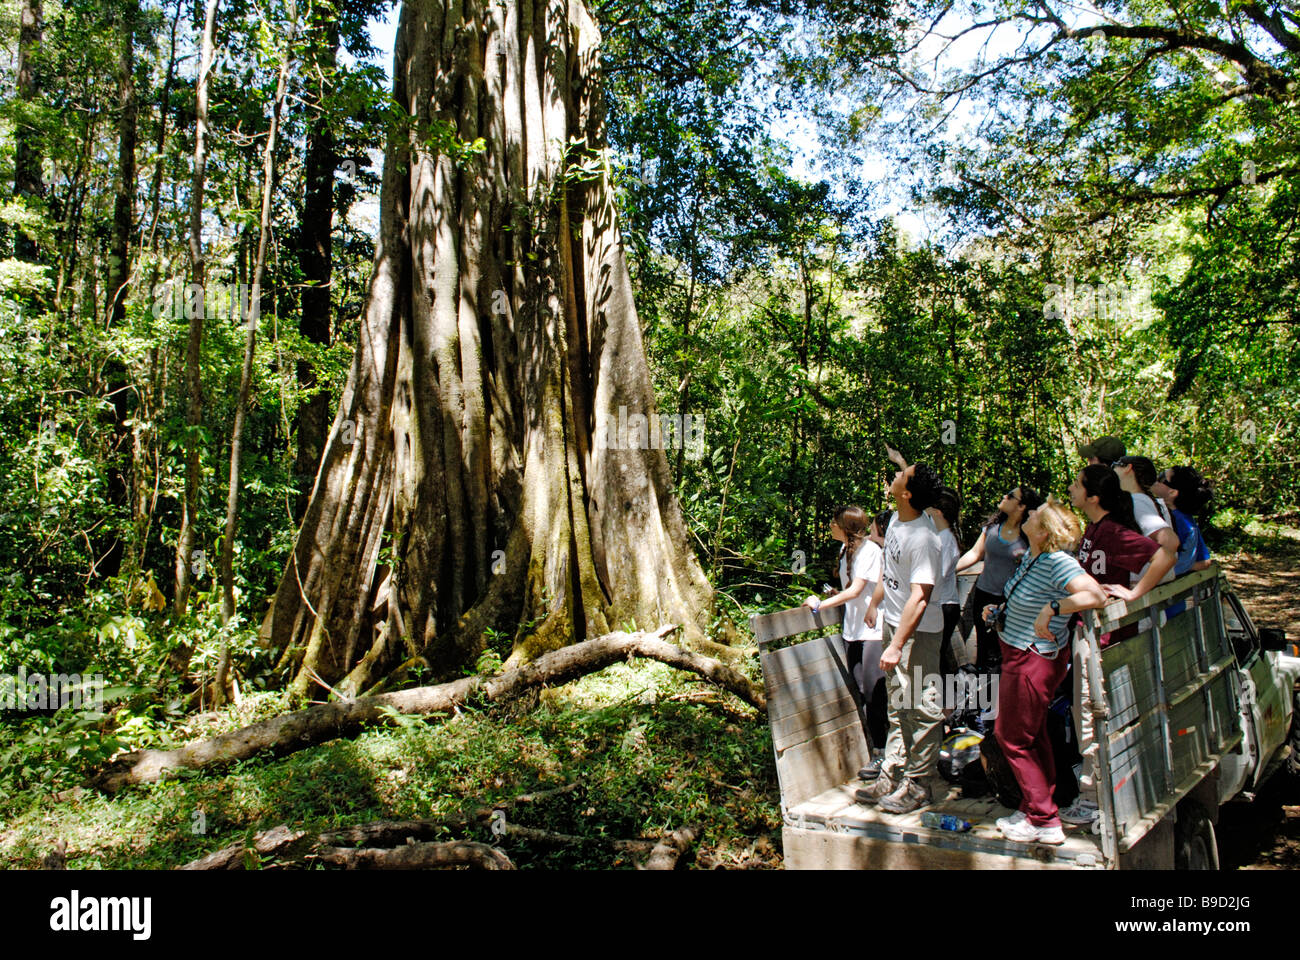 An ecotourism group looks up at giant strangler fig, Ficus aurea, La Amistad National Park, Costa Rica. - Stock Image